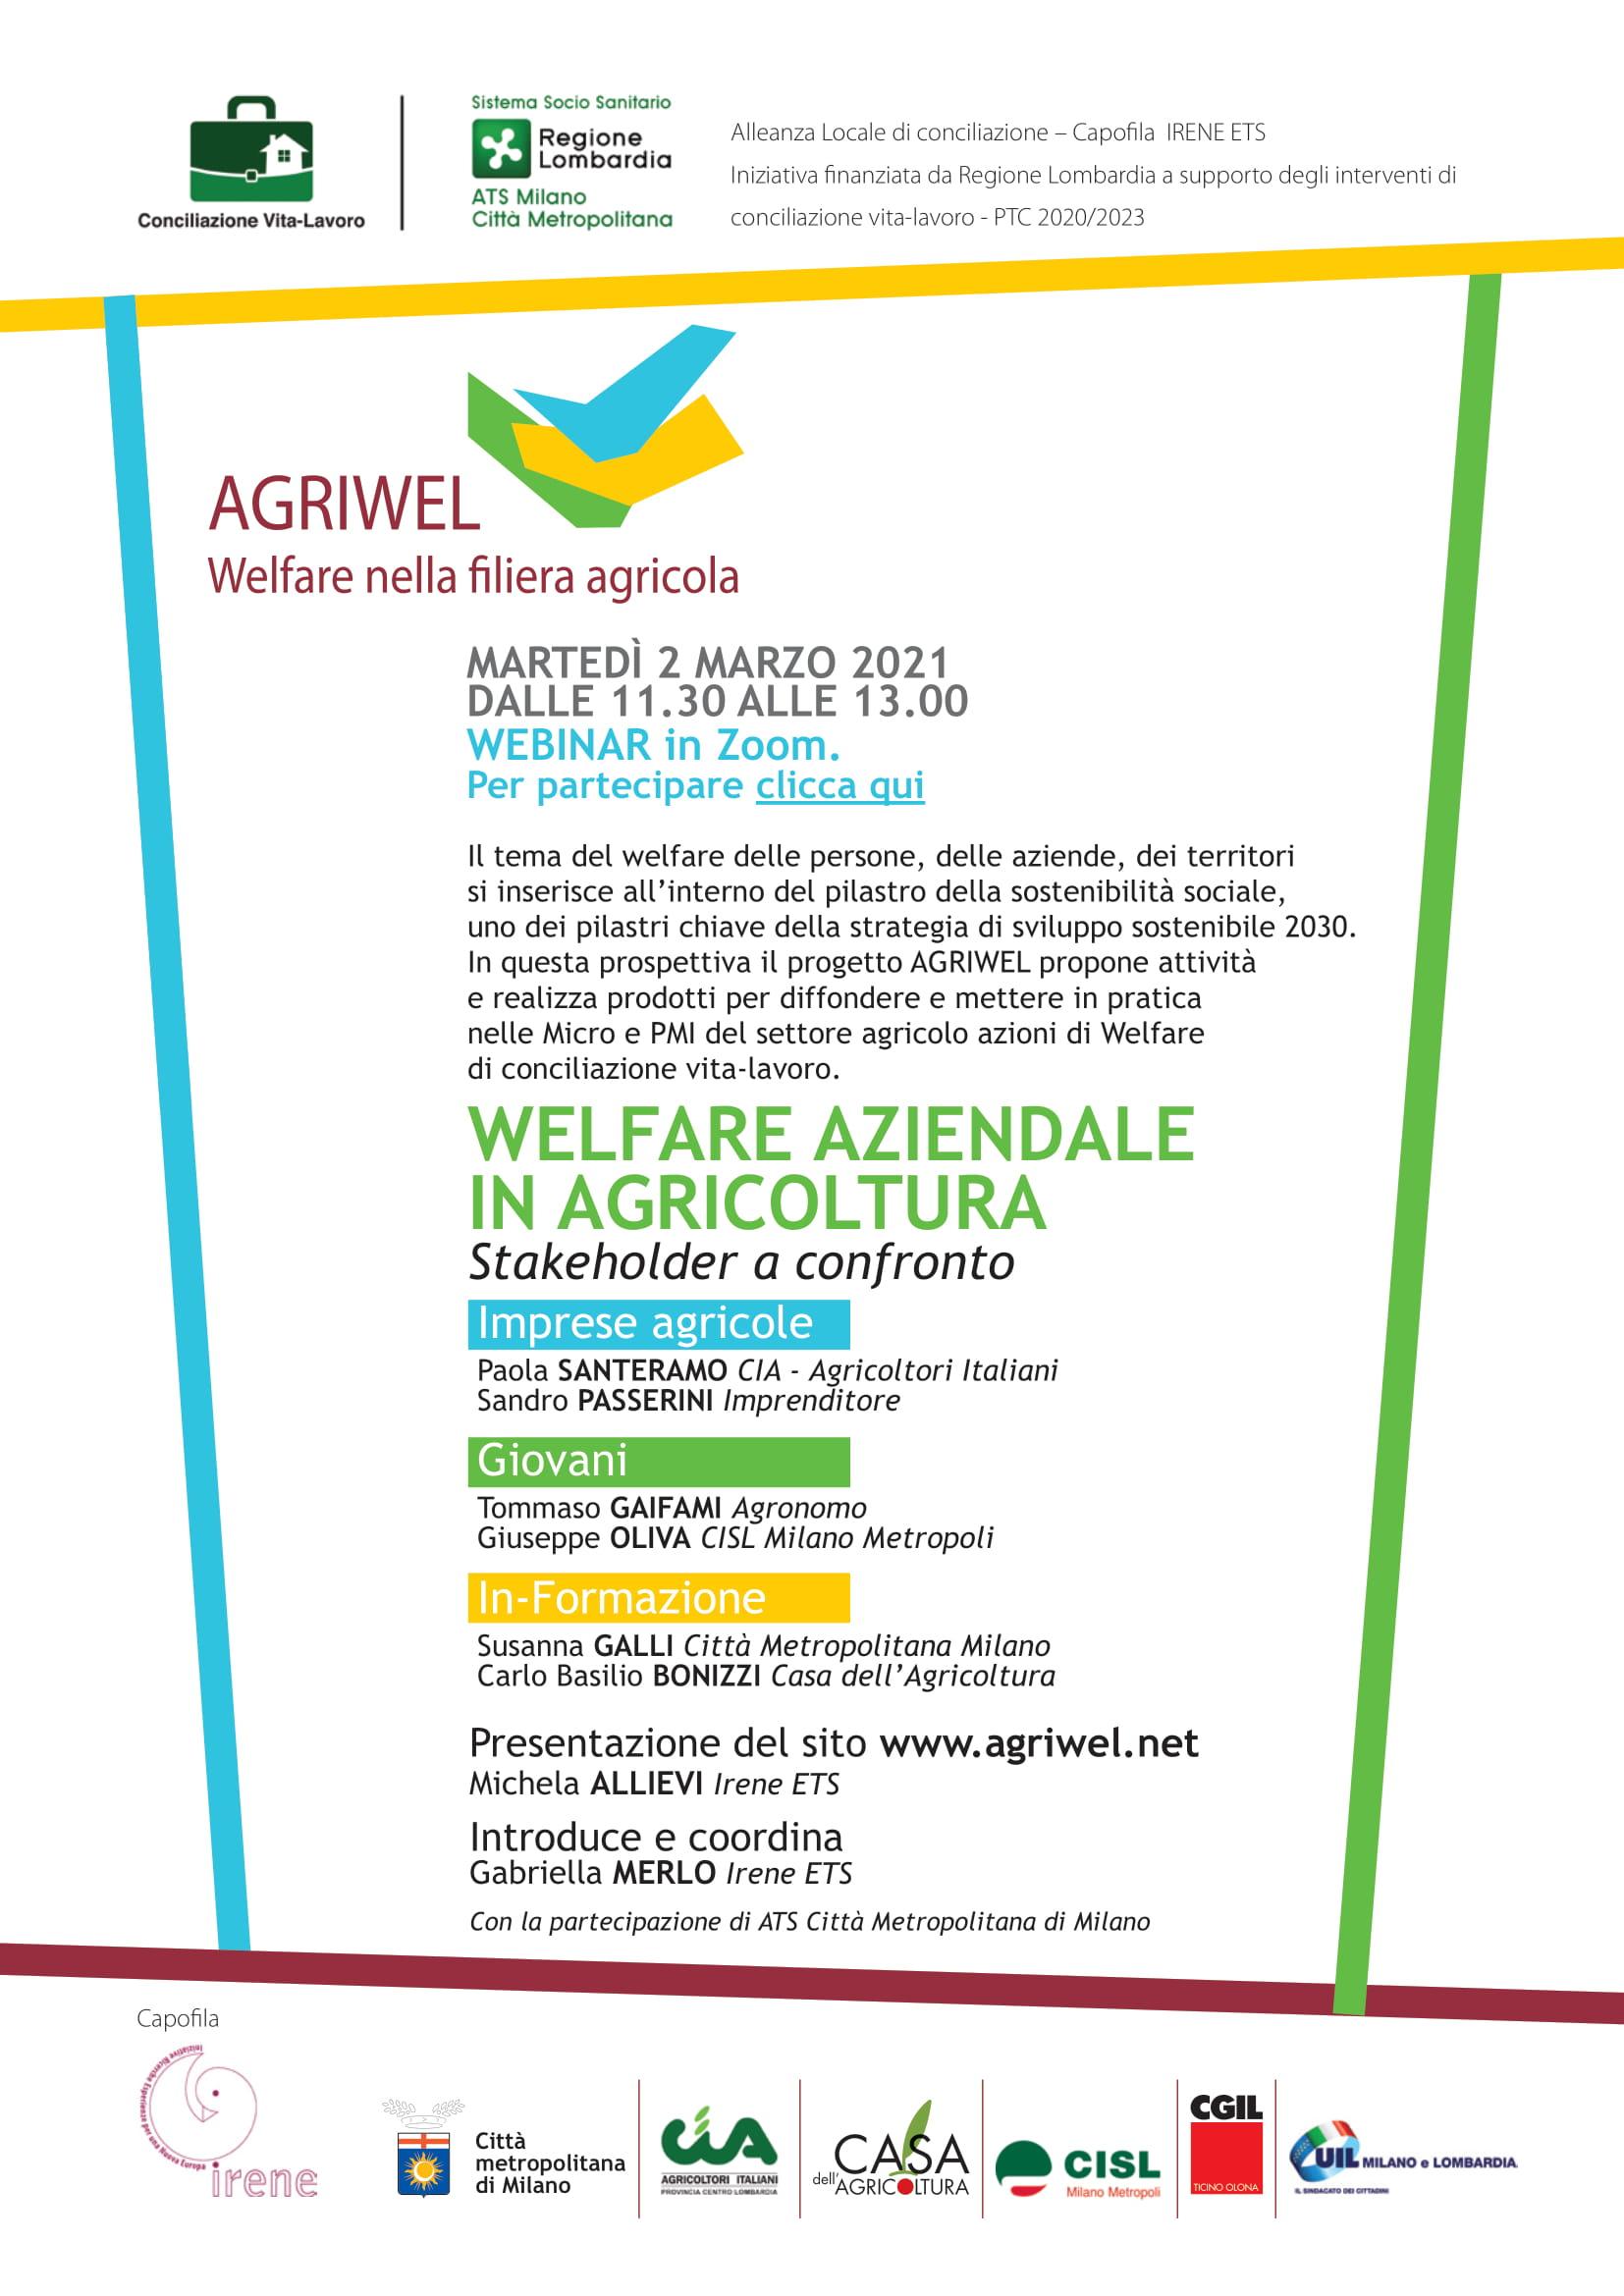 Welfare aziendale in agricoltura. Stakeholder a confronto